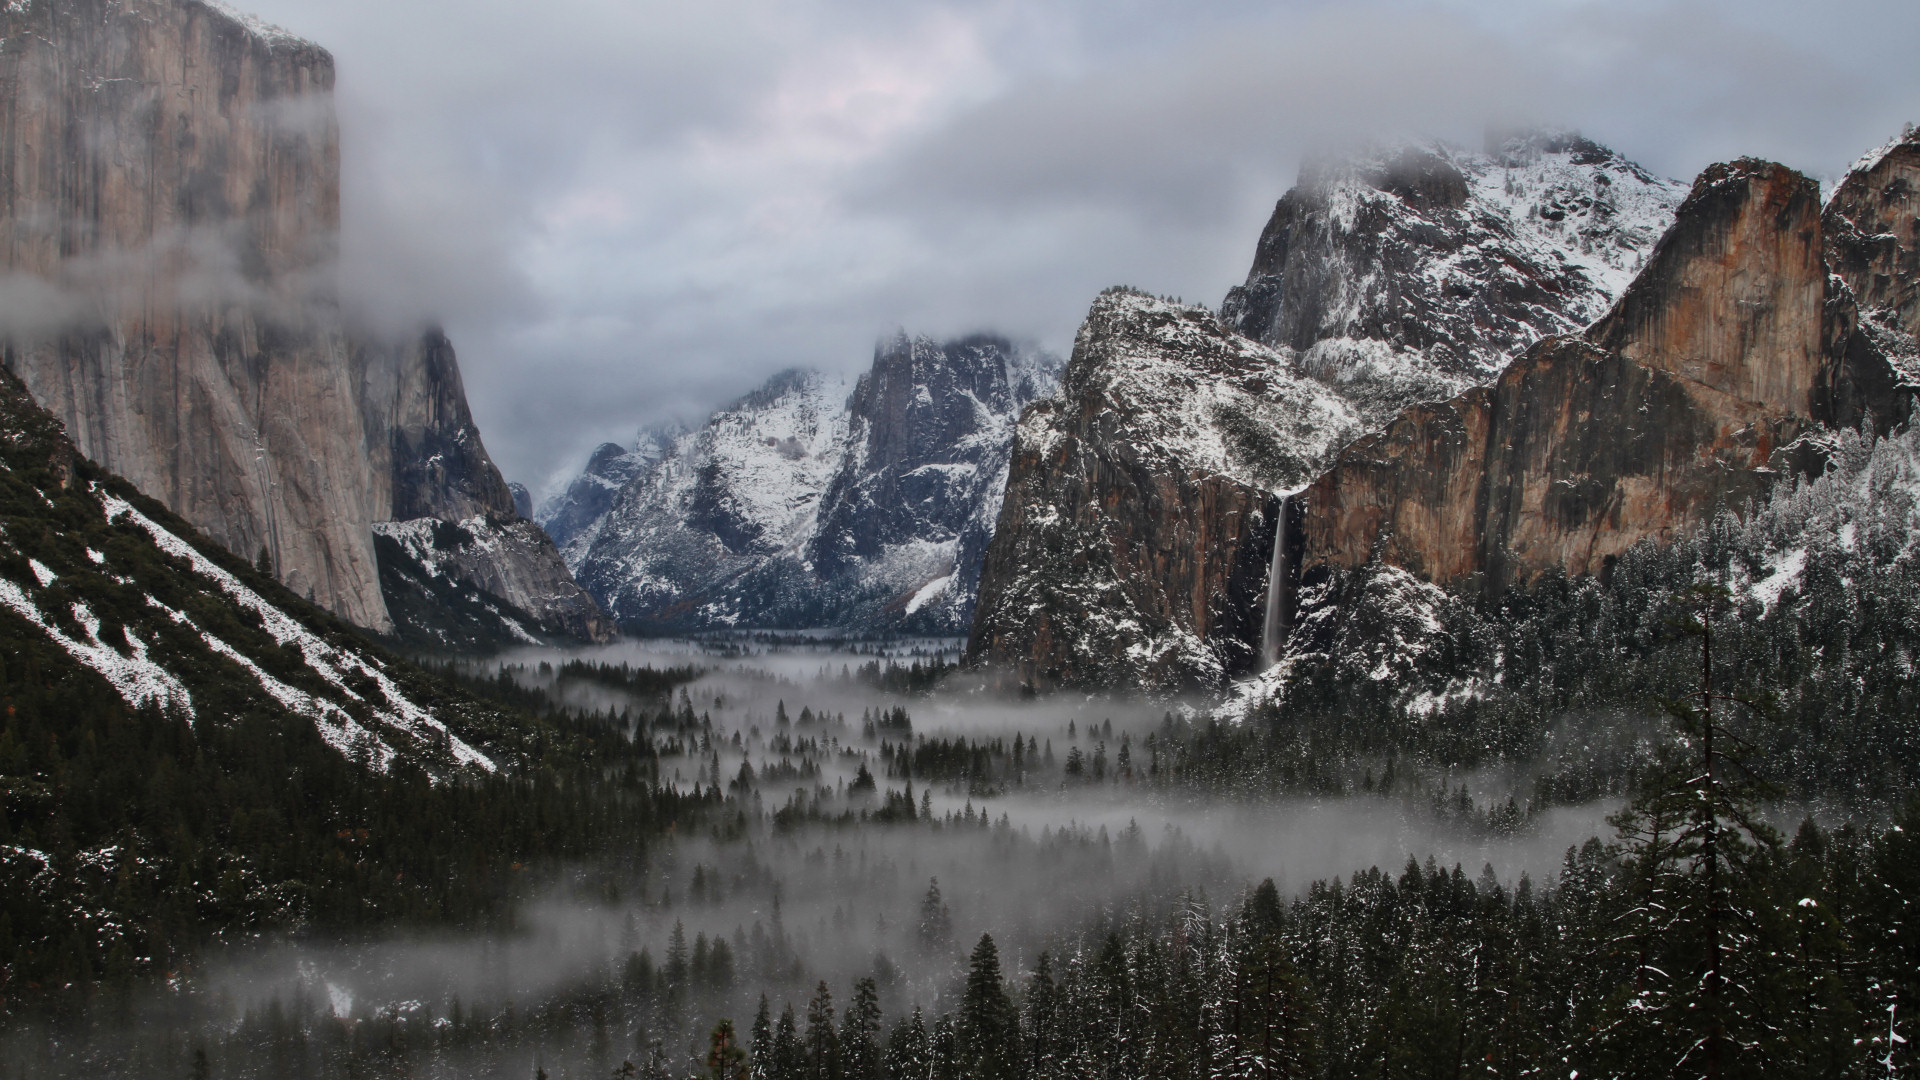 Yosemite Wallpapers   Yosemite Valley in Winter 1920x1080